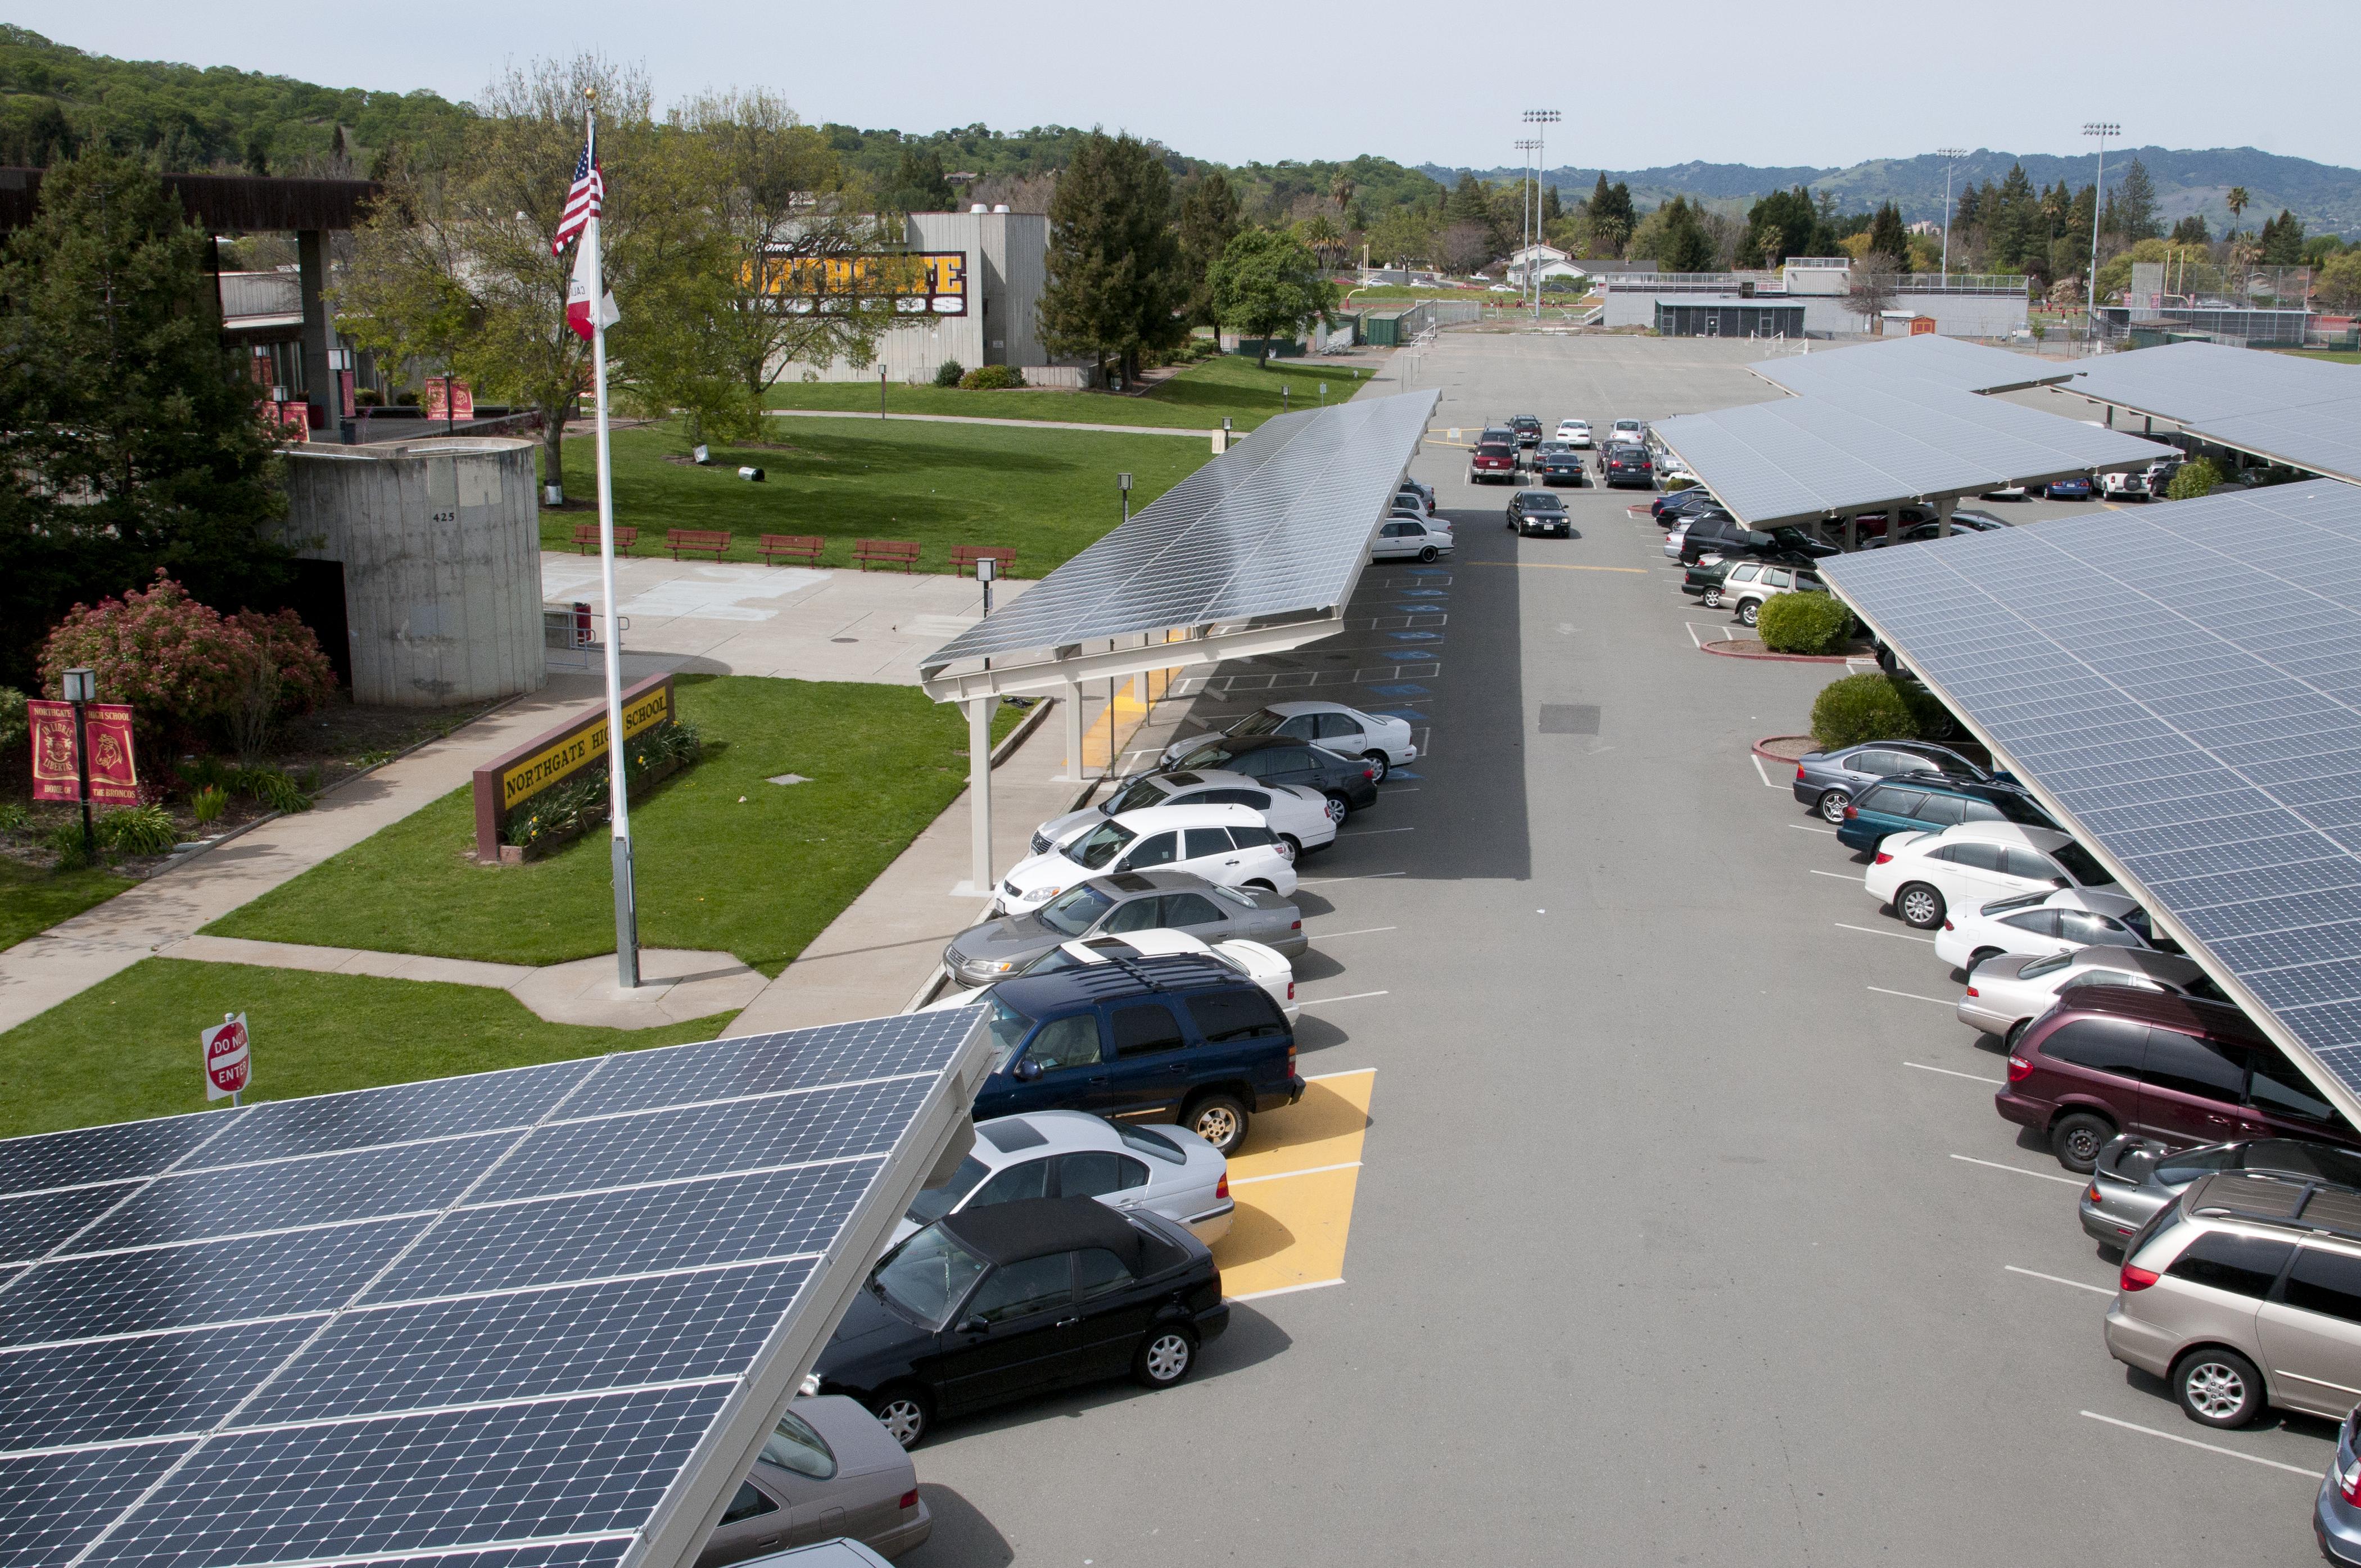 Parking lot with solar carports.